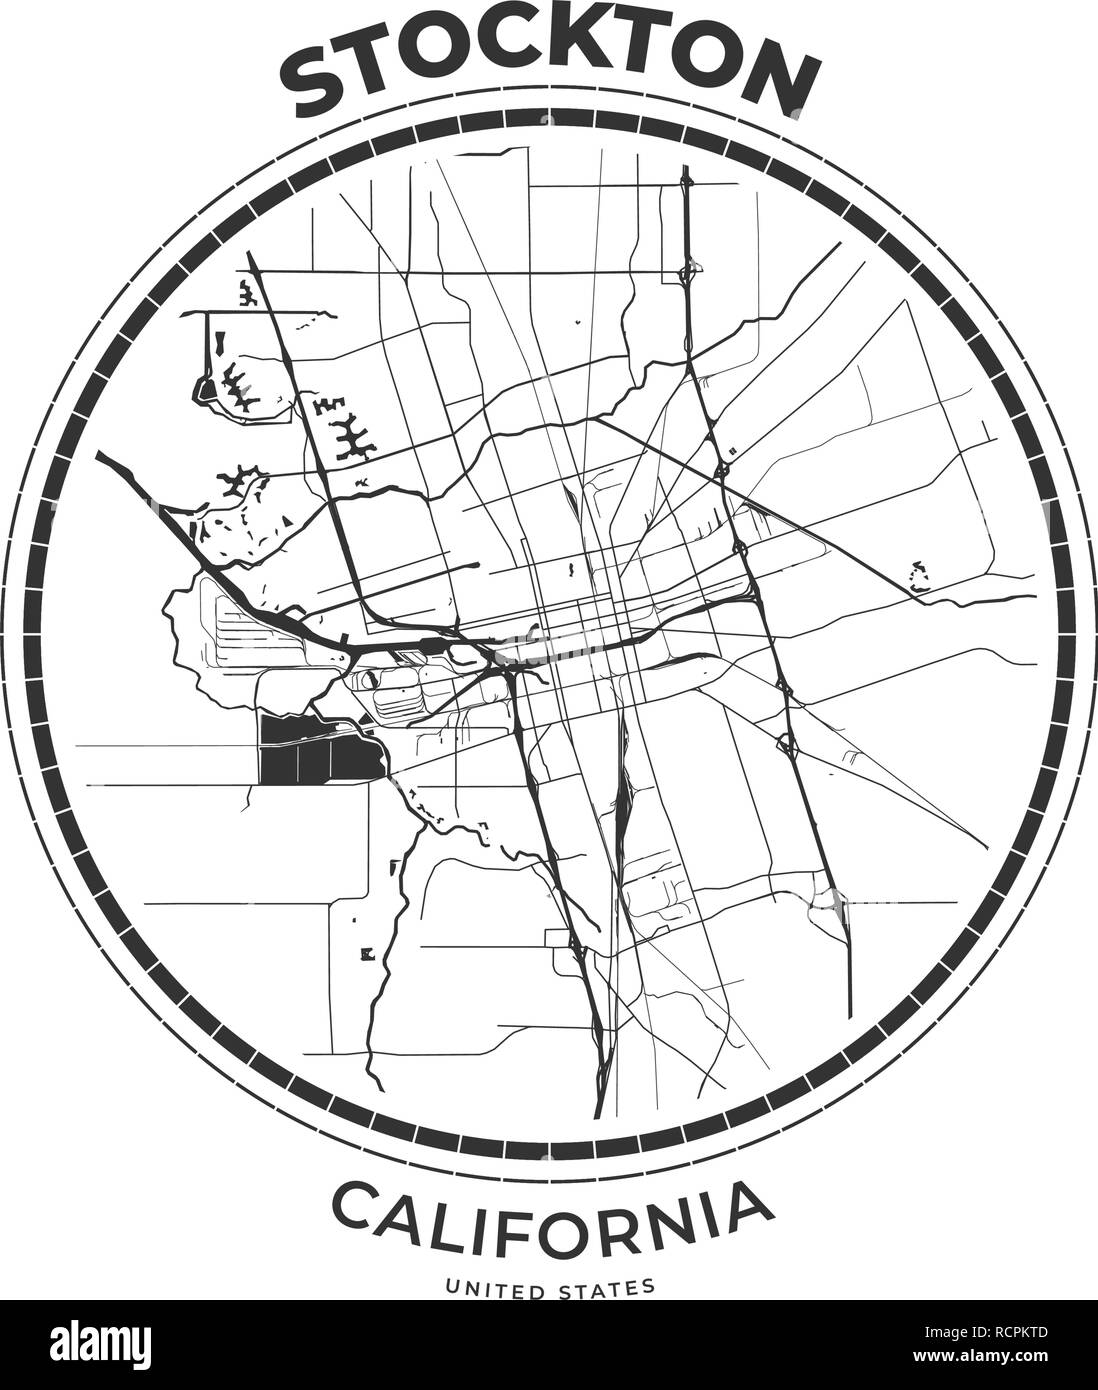 Stockton California City Stock Photos & Stockton California City ...